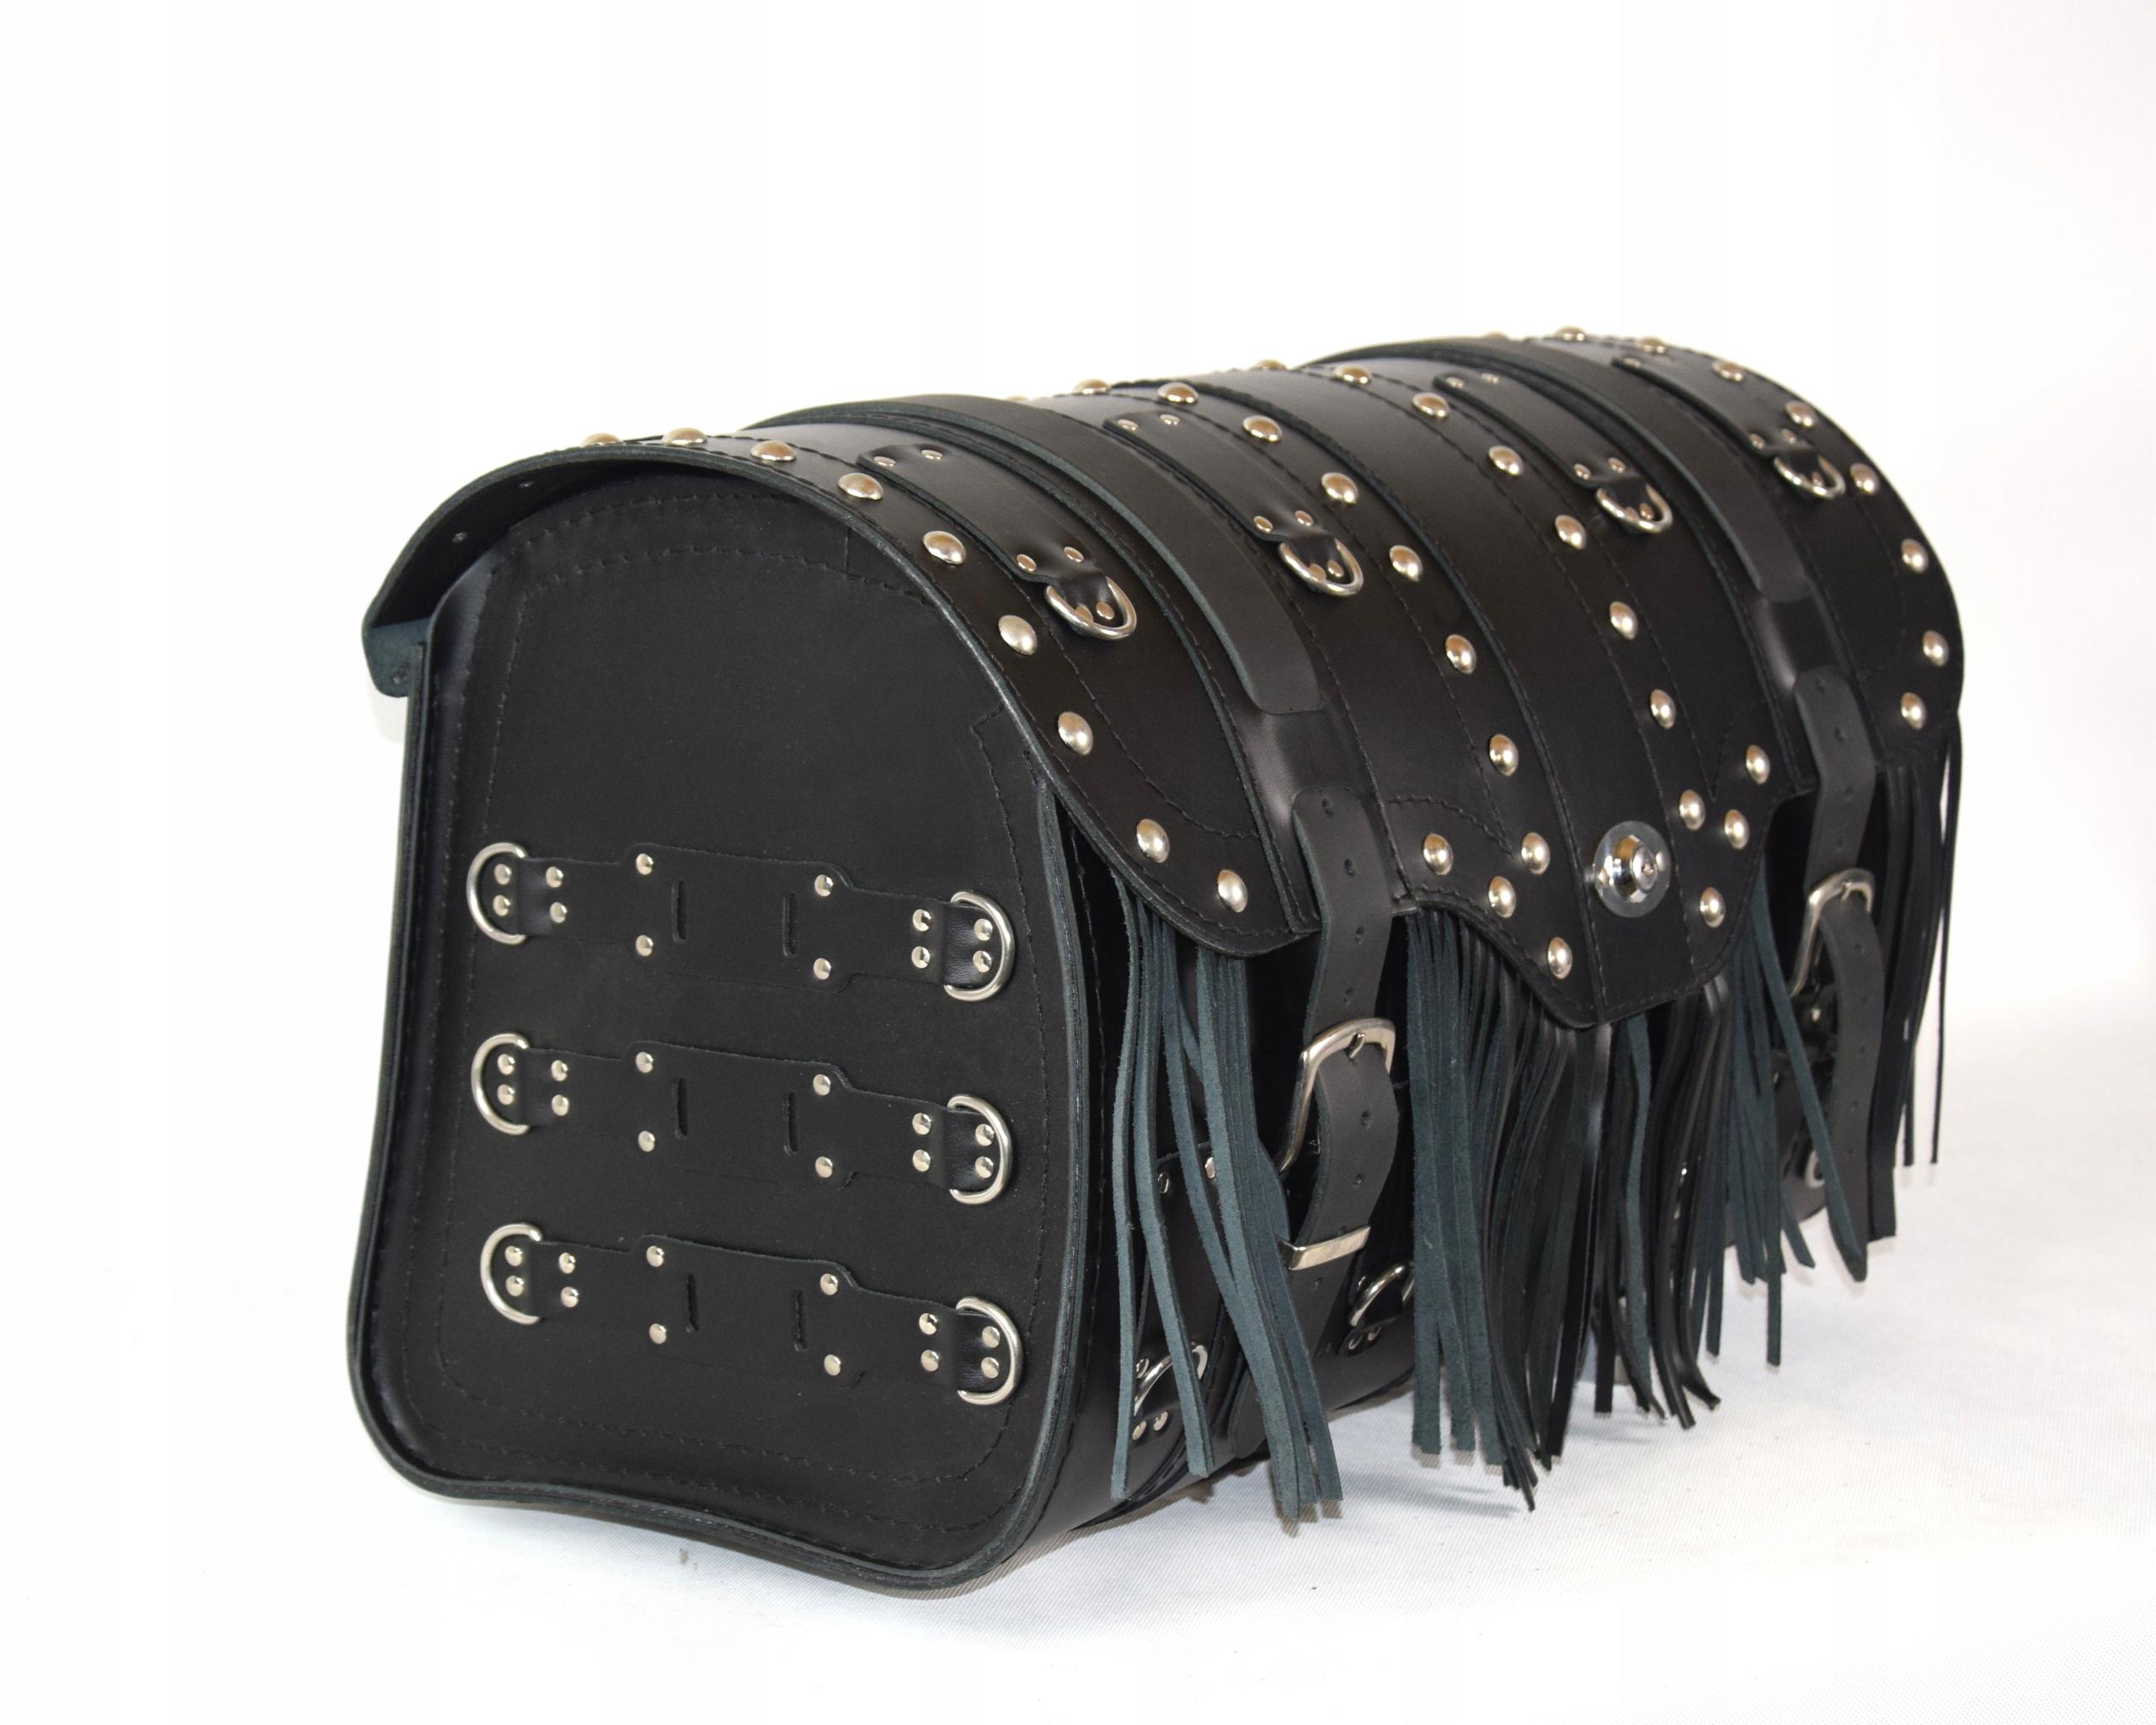 Kufer skórzany kufer tylni motocyklowy K15 Numer katalogowy producenta K15